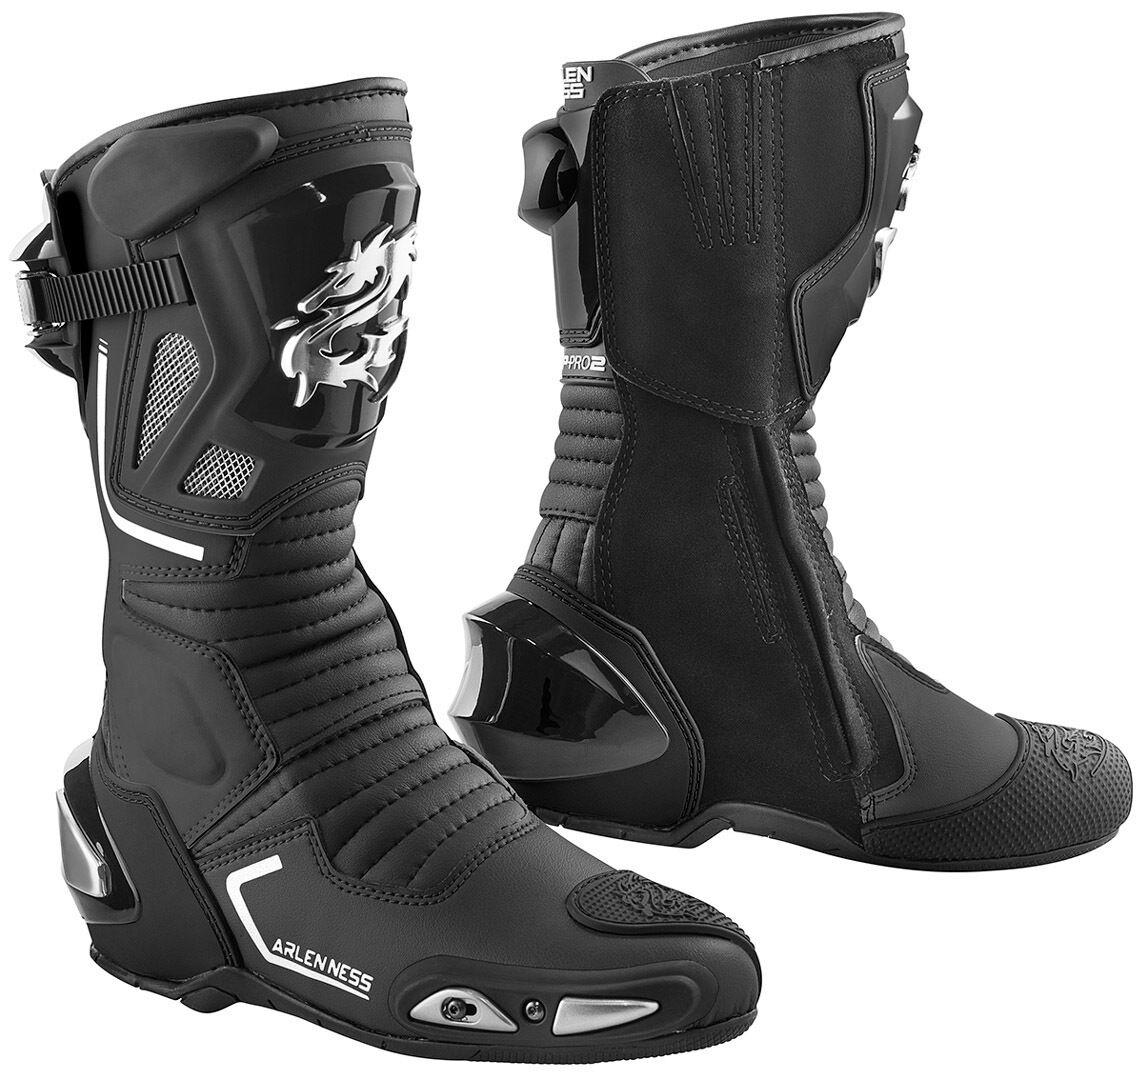 Arlen Ness Sugello Bottes de moto Noir taille : 41